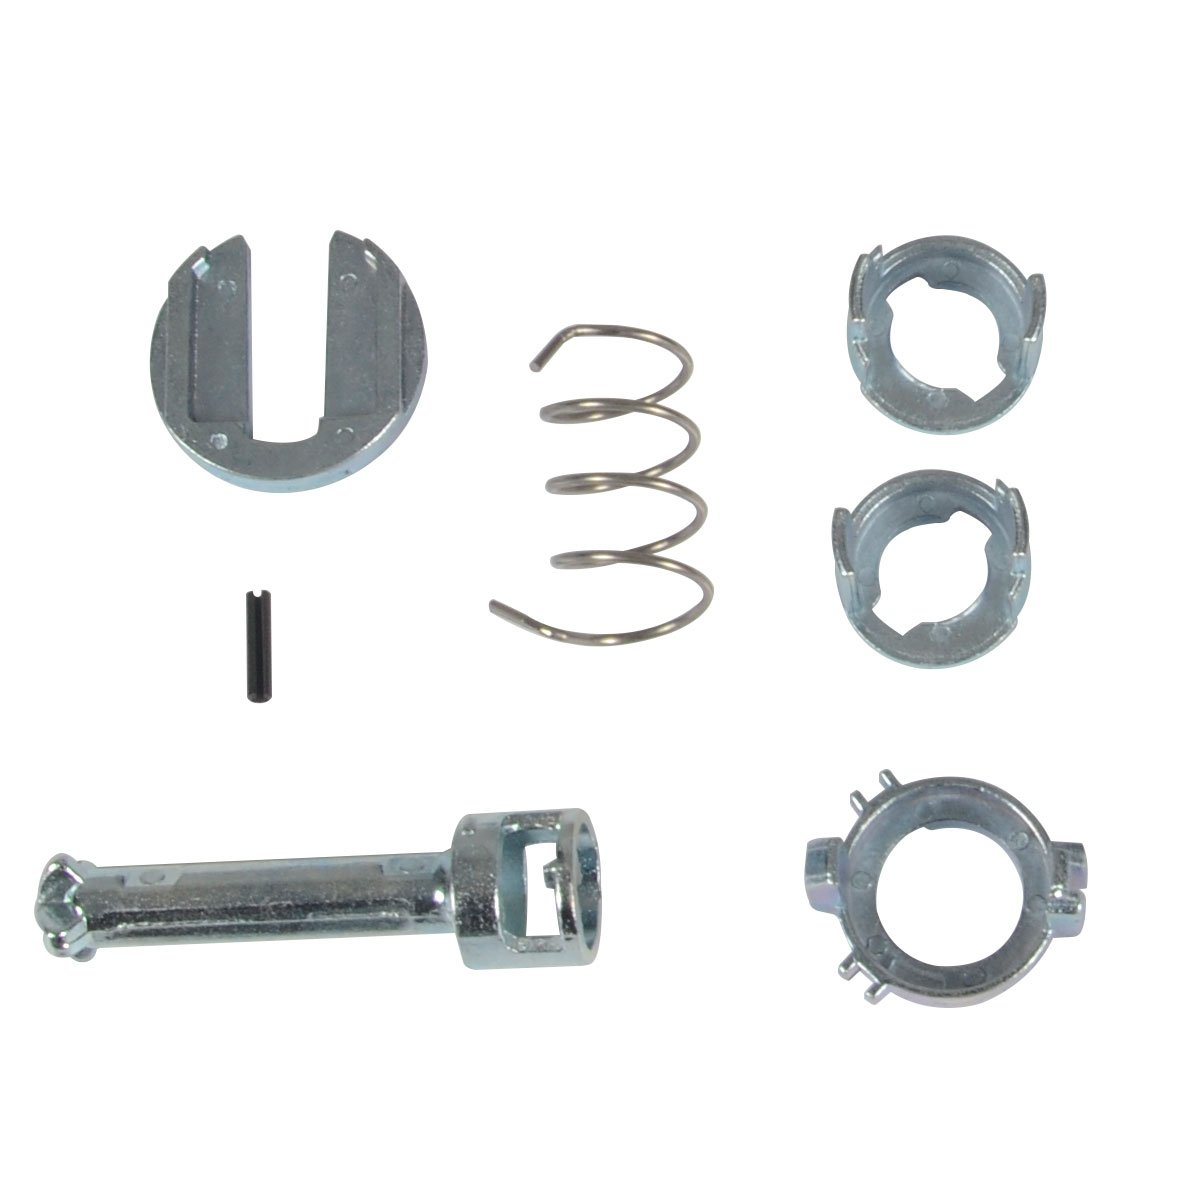 Door Lock Repair Kit for BMW E46 Series 320i 323i 325Ci 328i 330i 2001-2006 Front Left or Right 7-PC Set PremiumpartsWhosale